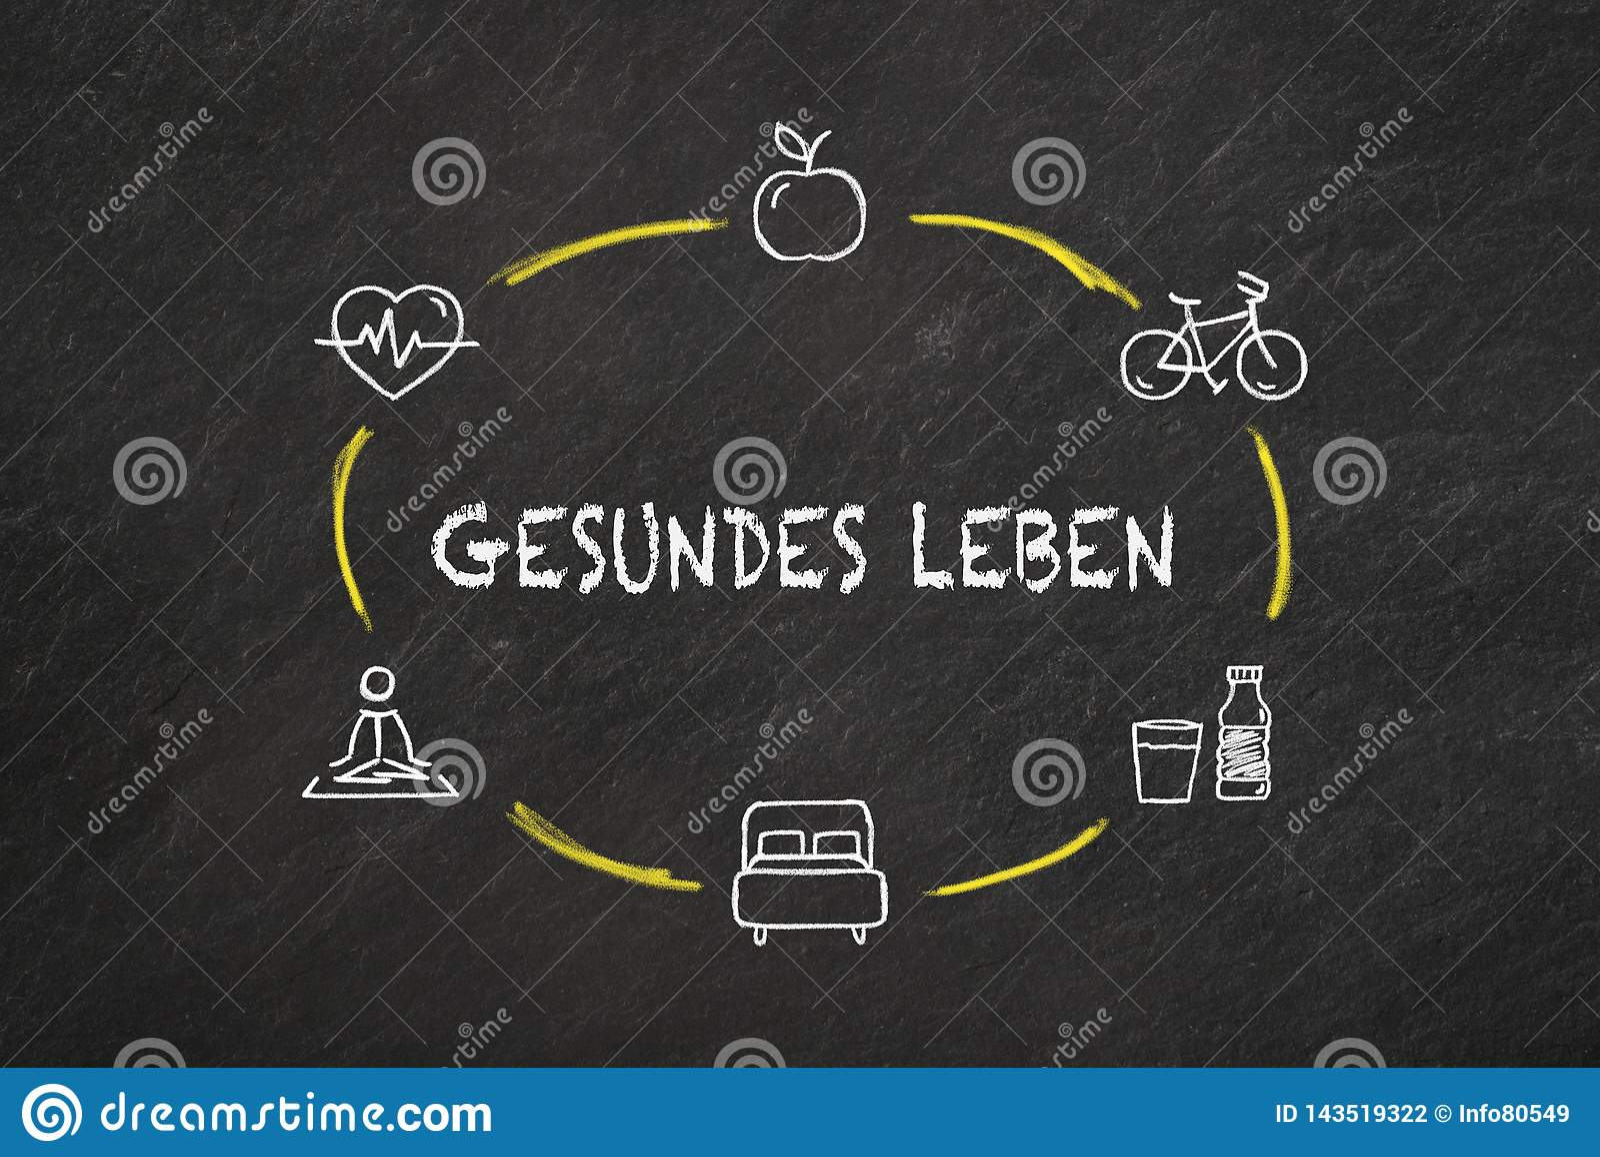 'Gesundes Leben'文本和象在黑板 翻译'健康生活'